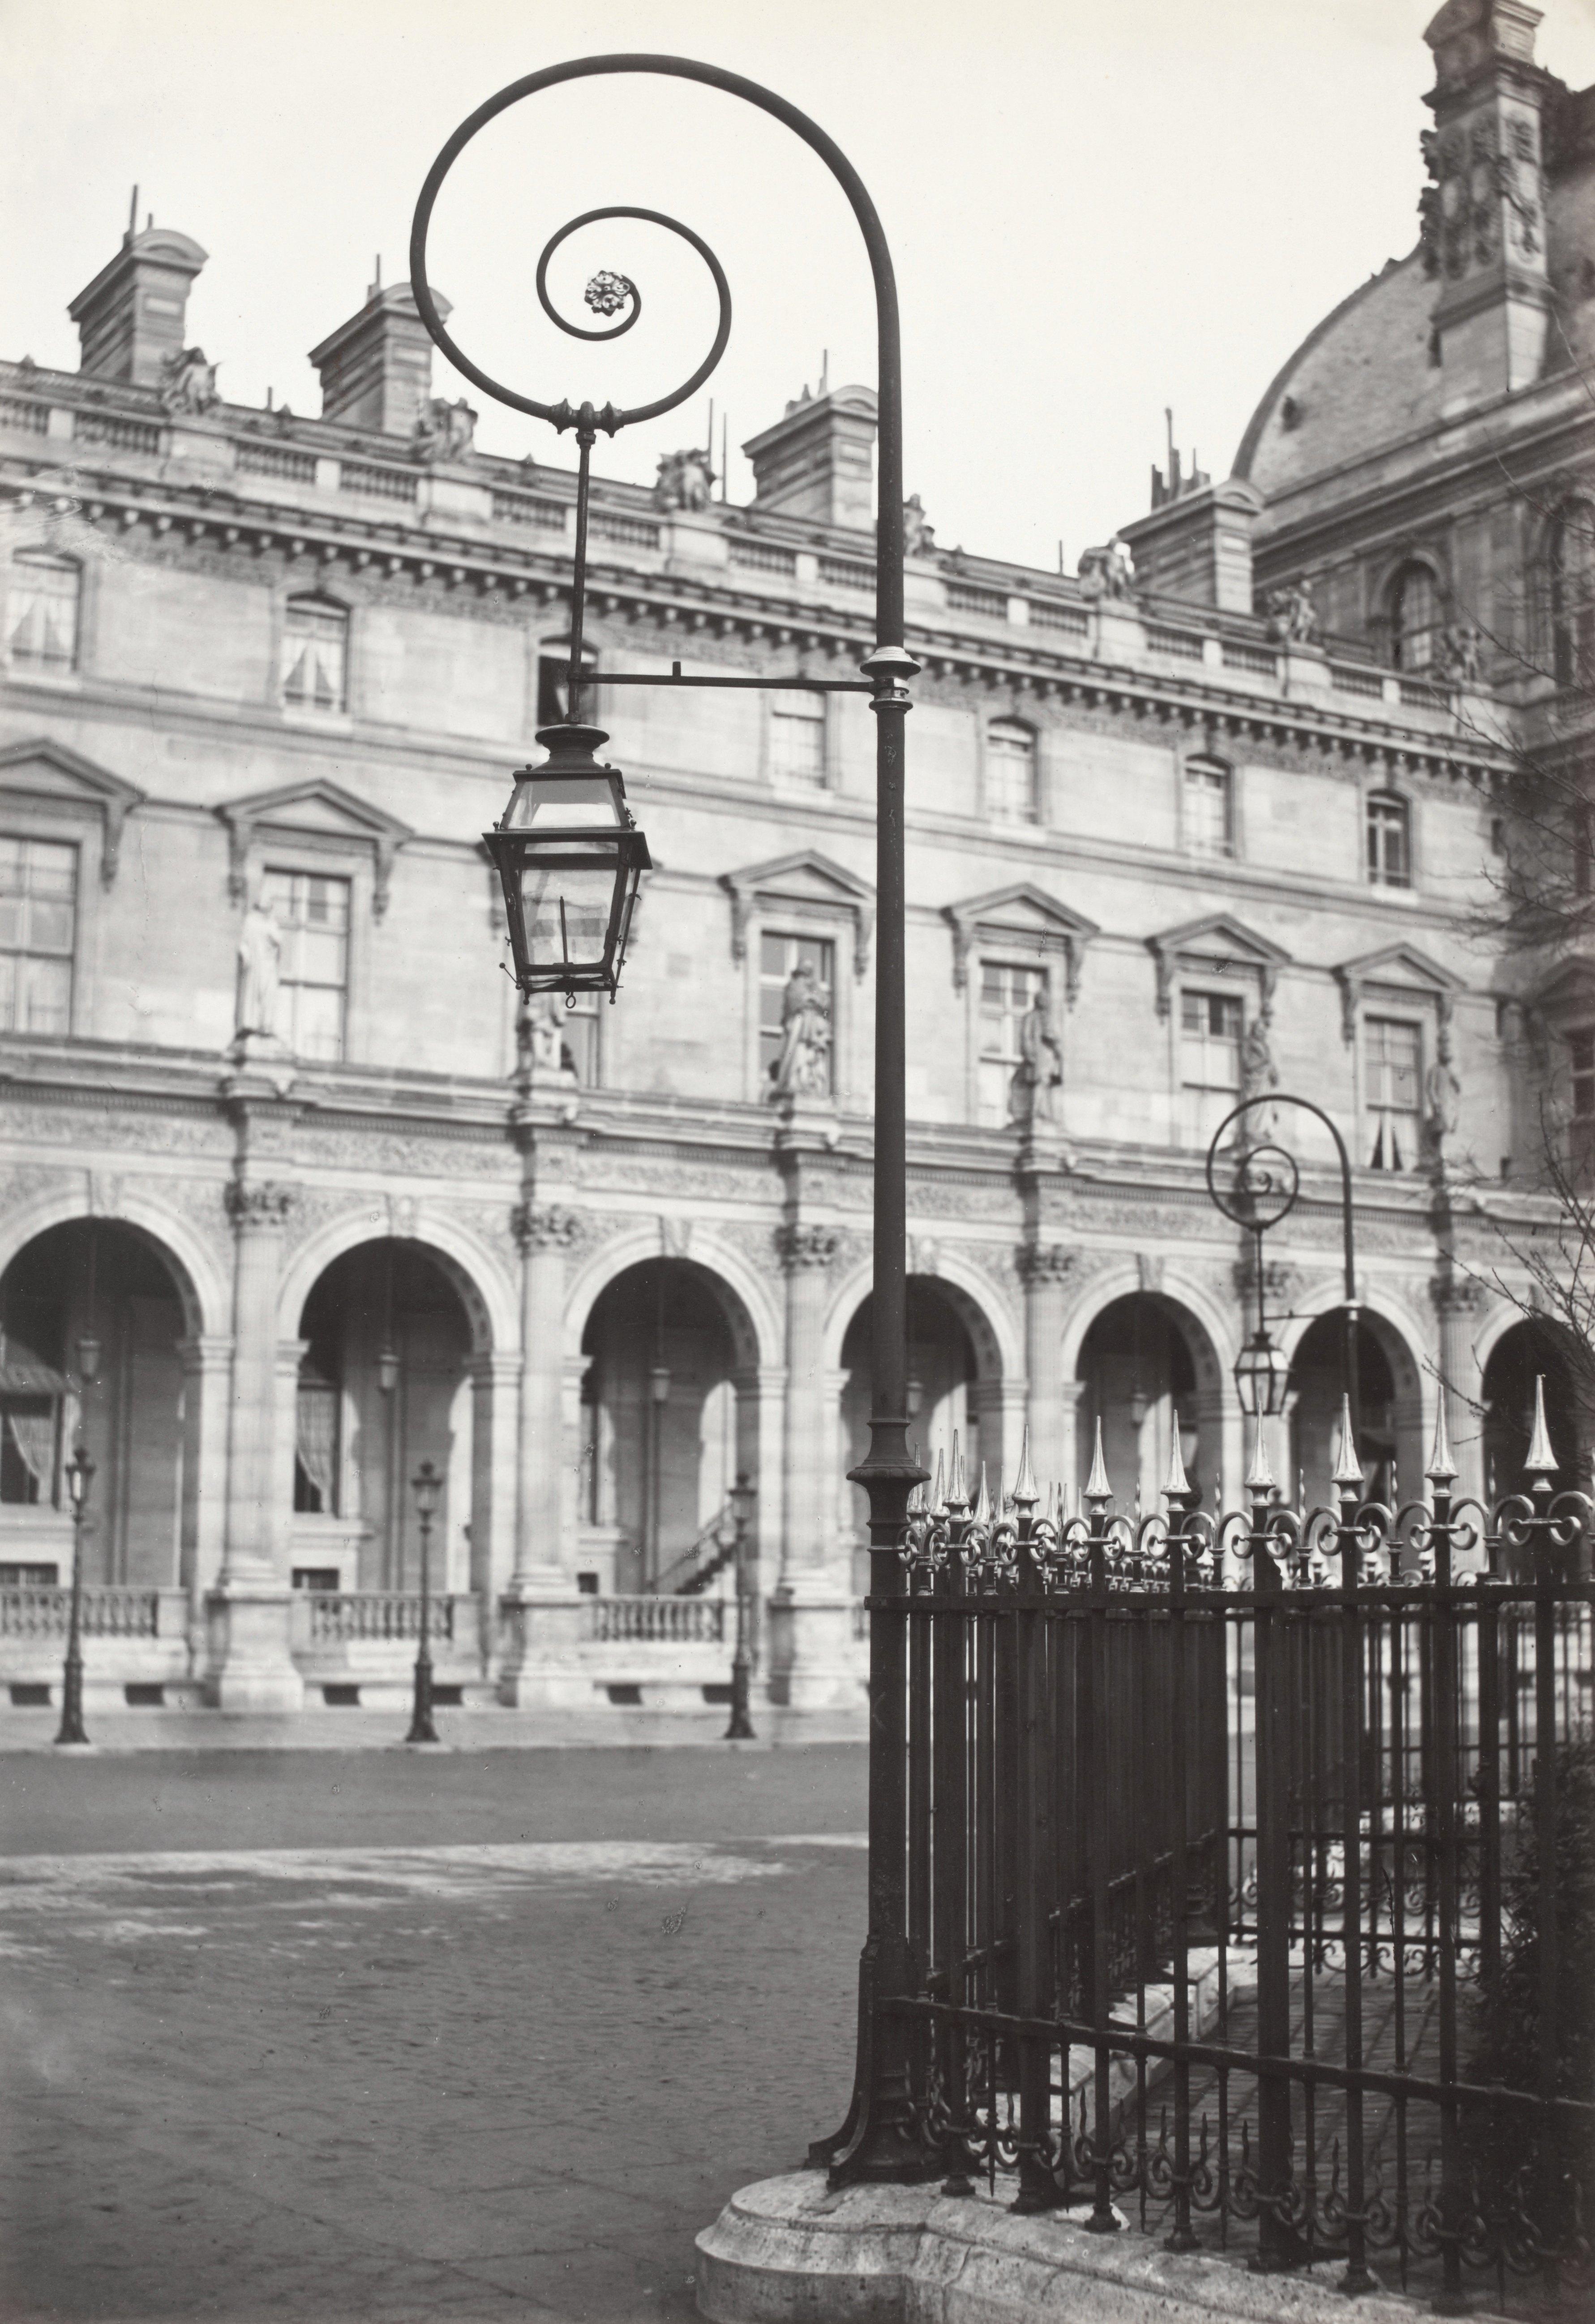 lampadaire paris charles marville louvre place napoleon iii 1878 la boite verte. Black Bedroom Furniture Sets. Home Design Ideas